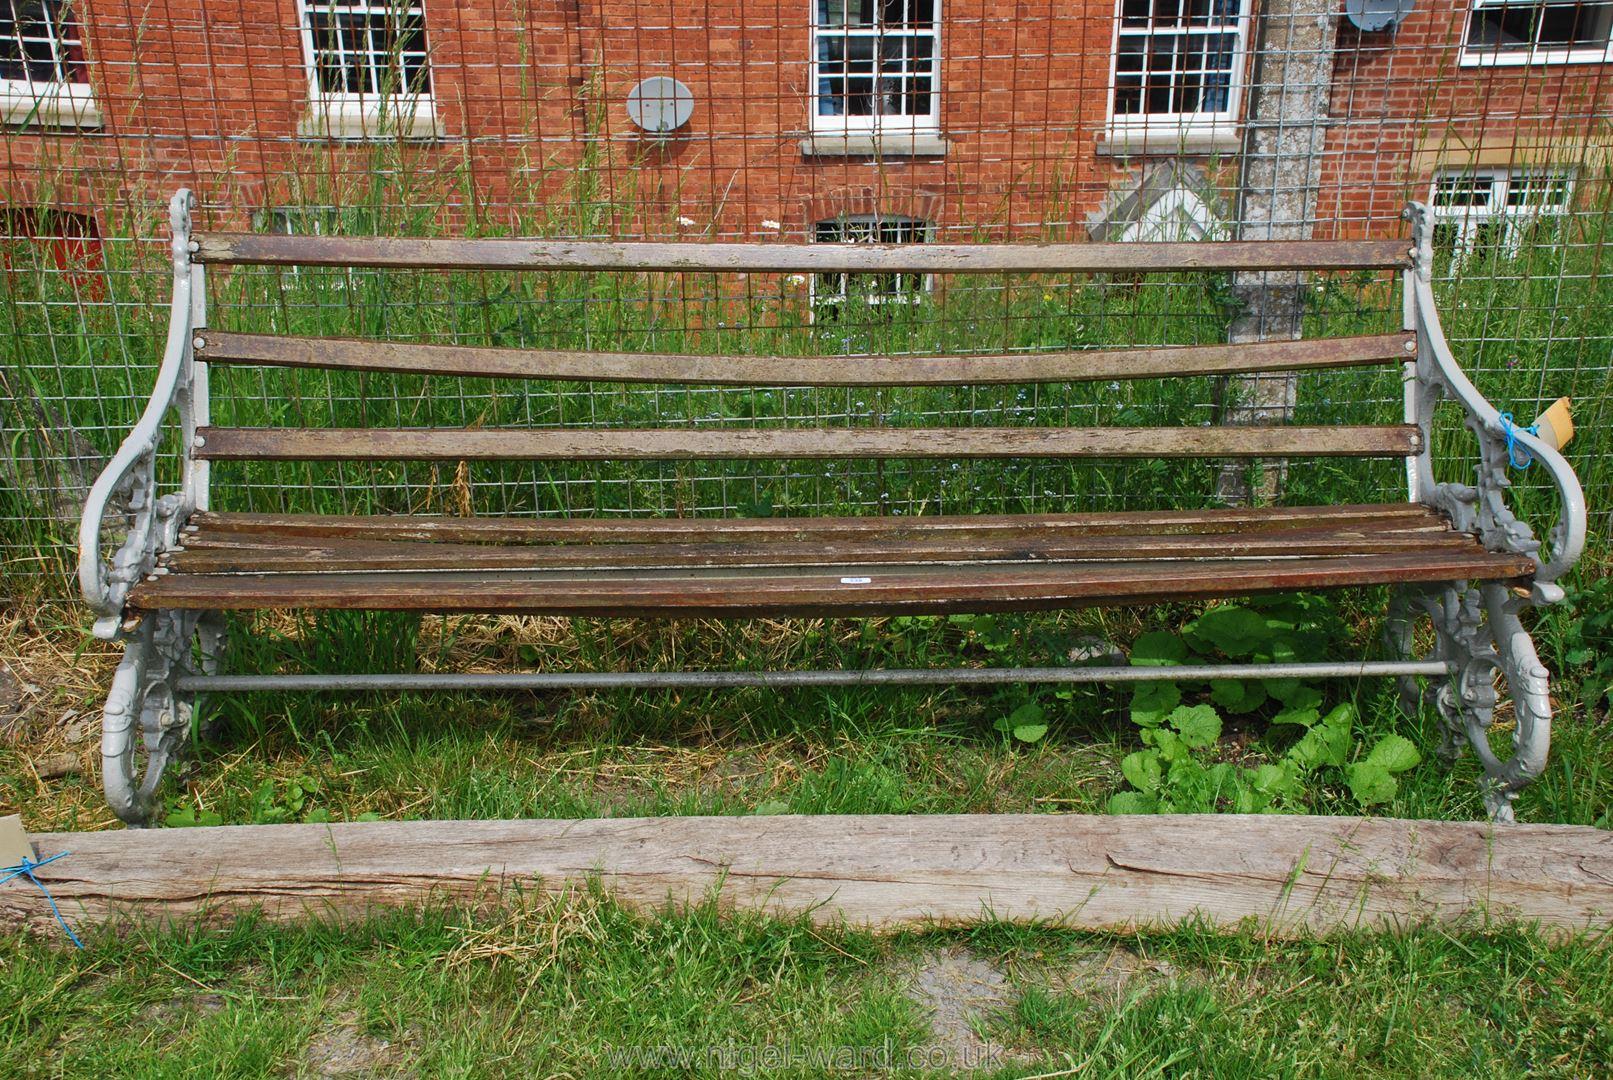 A heavy cast iron ended 6' garden Bench.